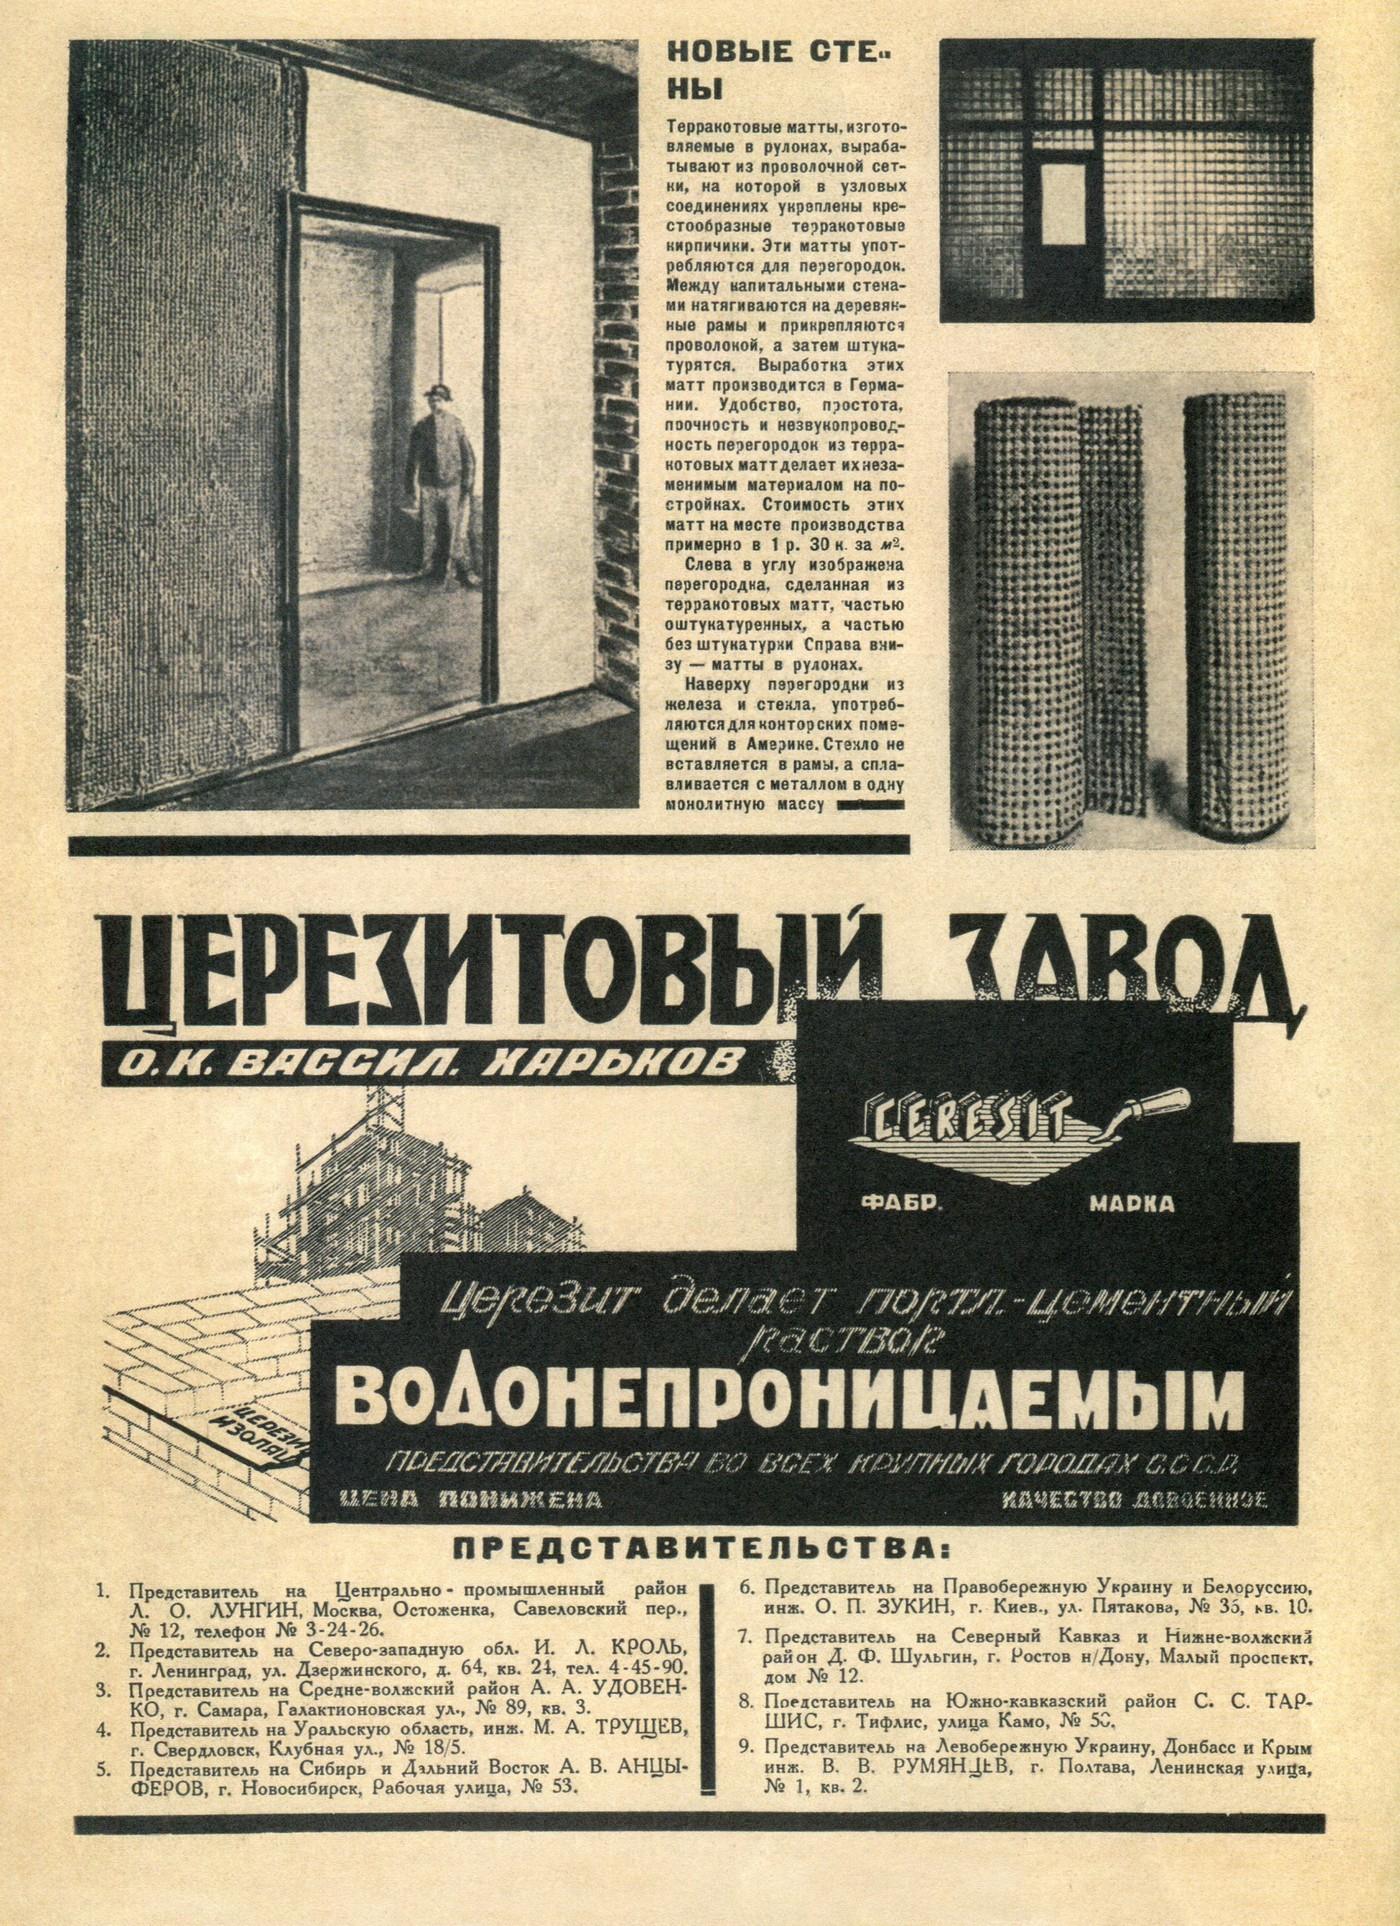 tehne.com-sa-1927-2-1400-002